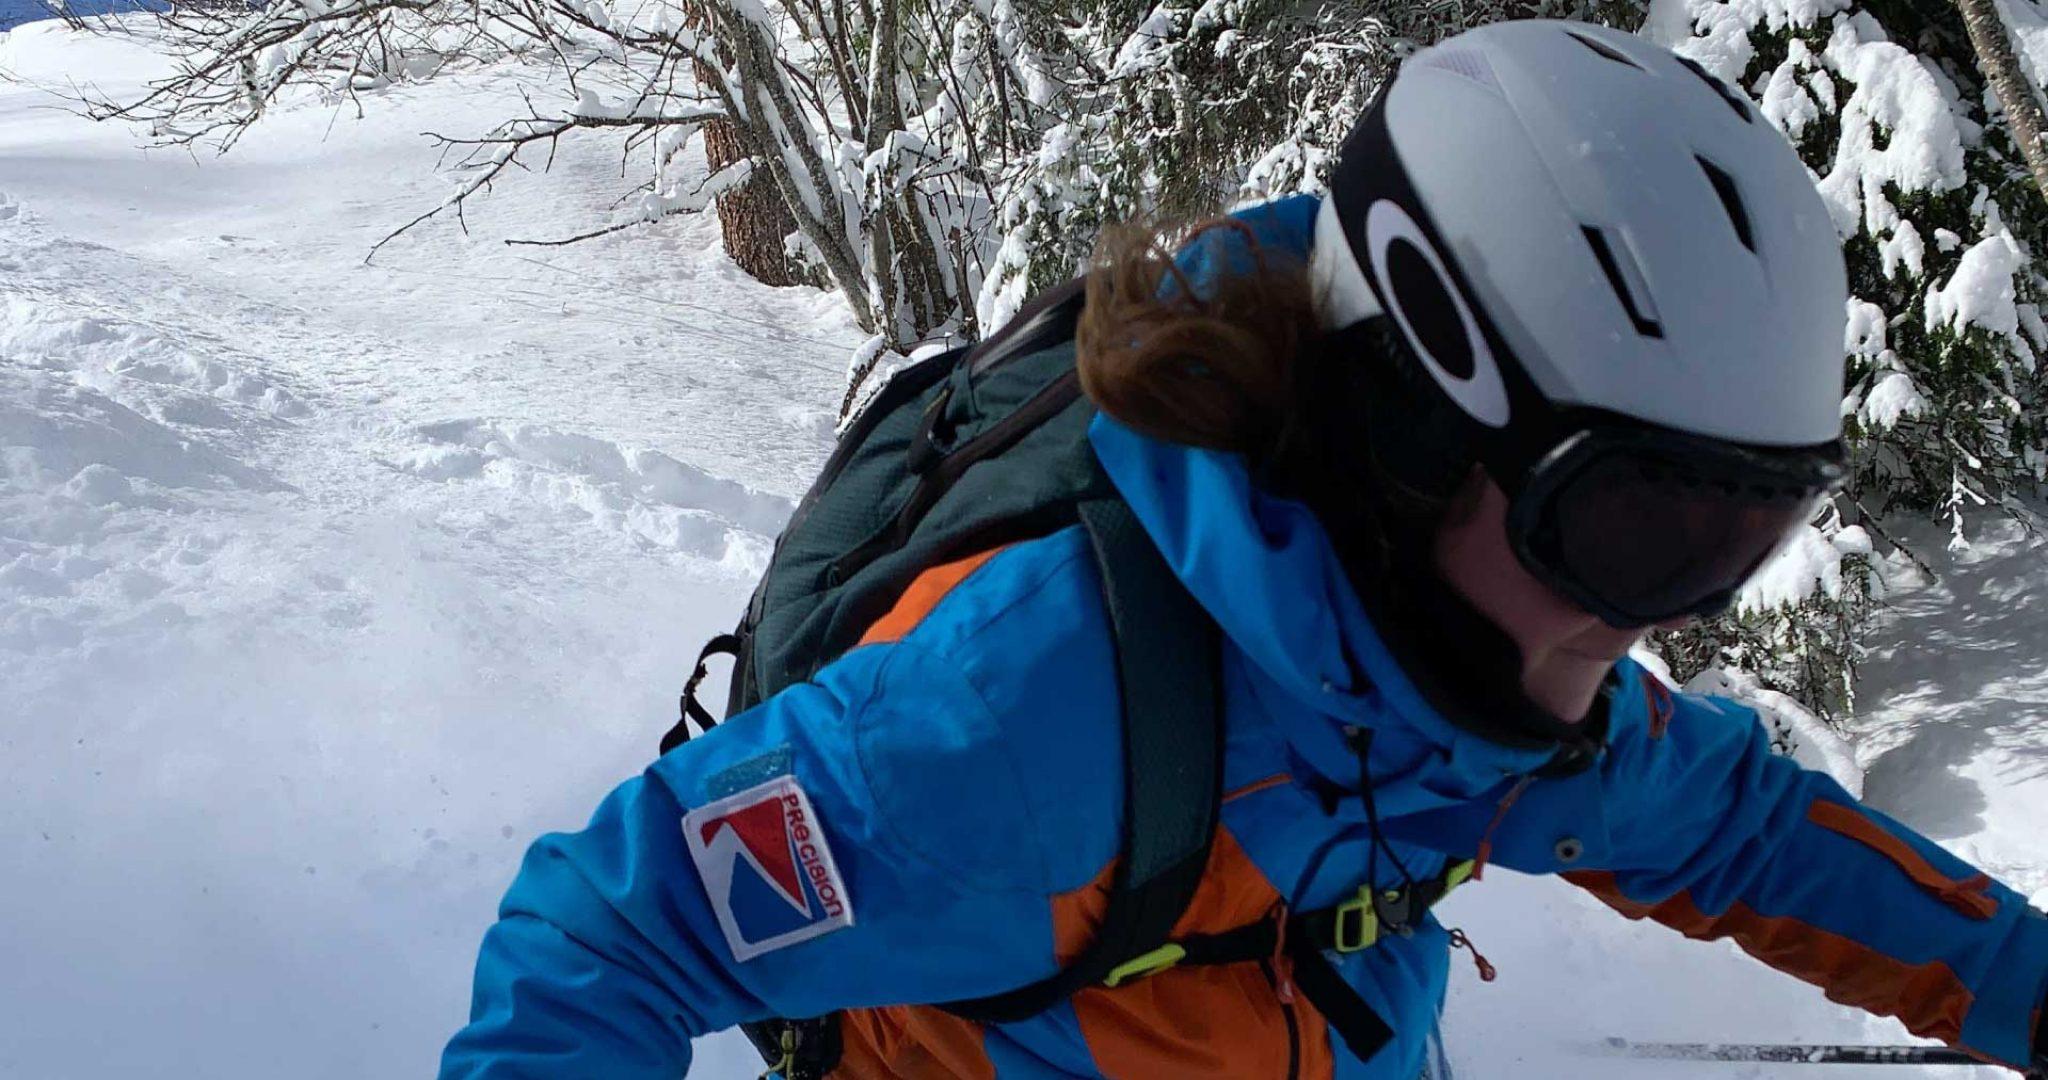 equipement-ski